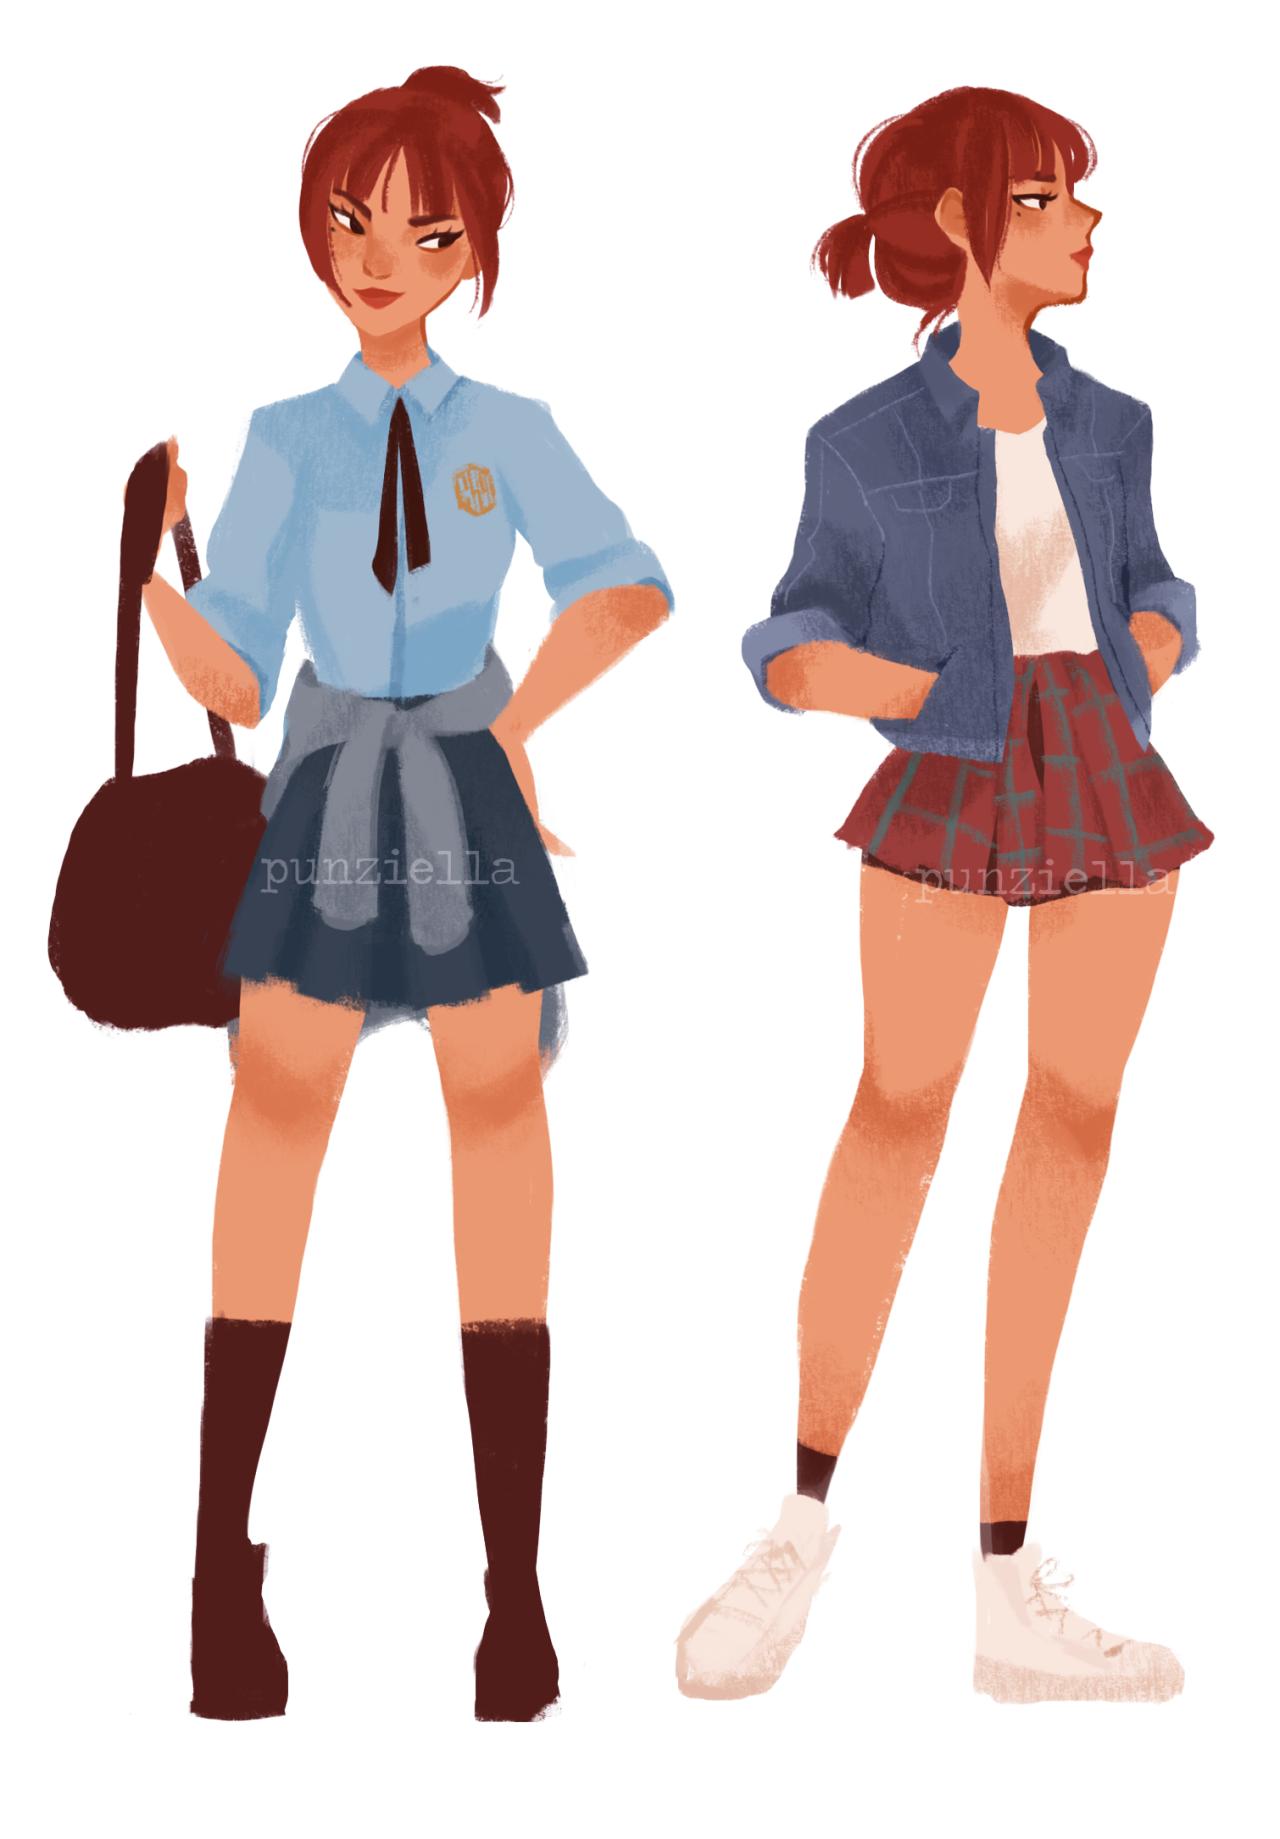 Character Design Cartoon Girl : Pauline ph she her paulinejdb gmail faq art edits